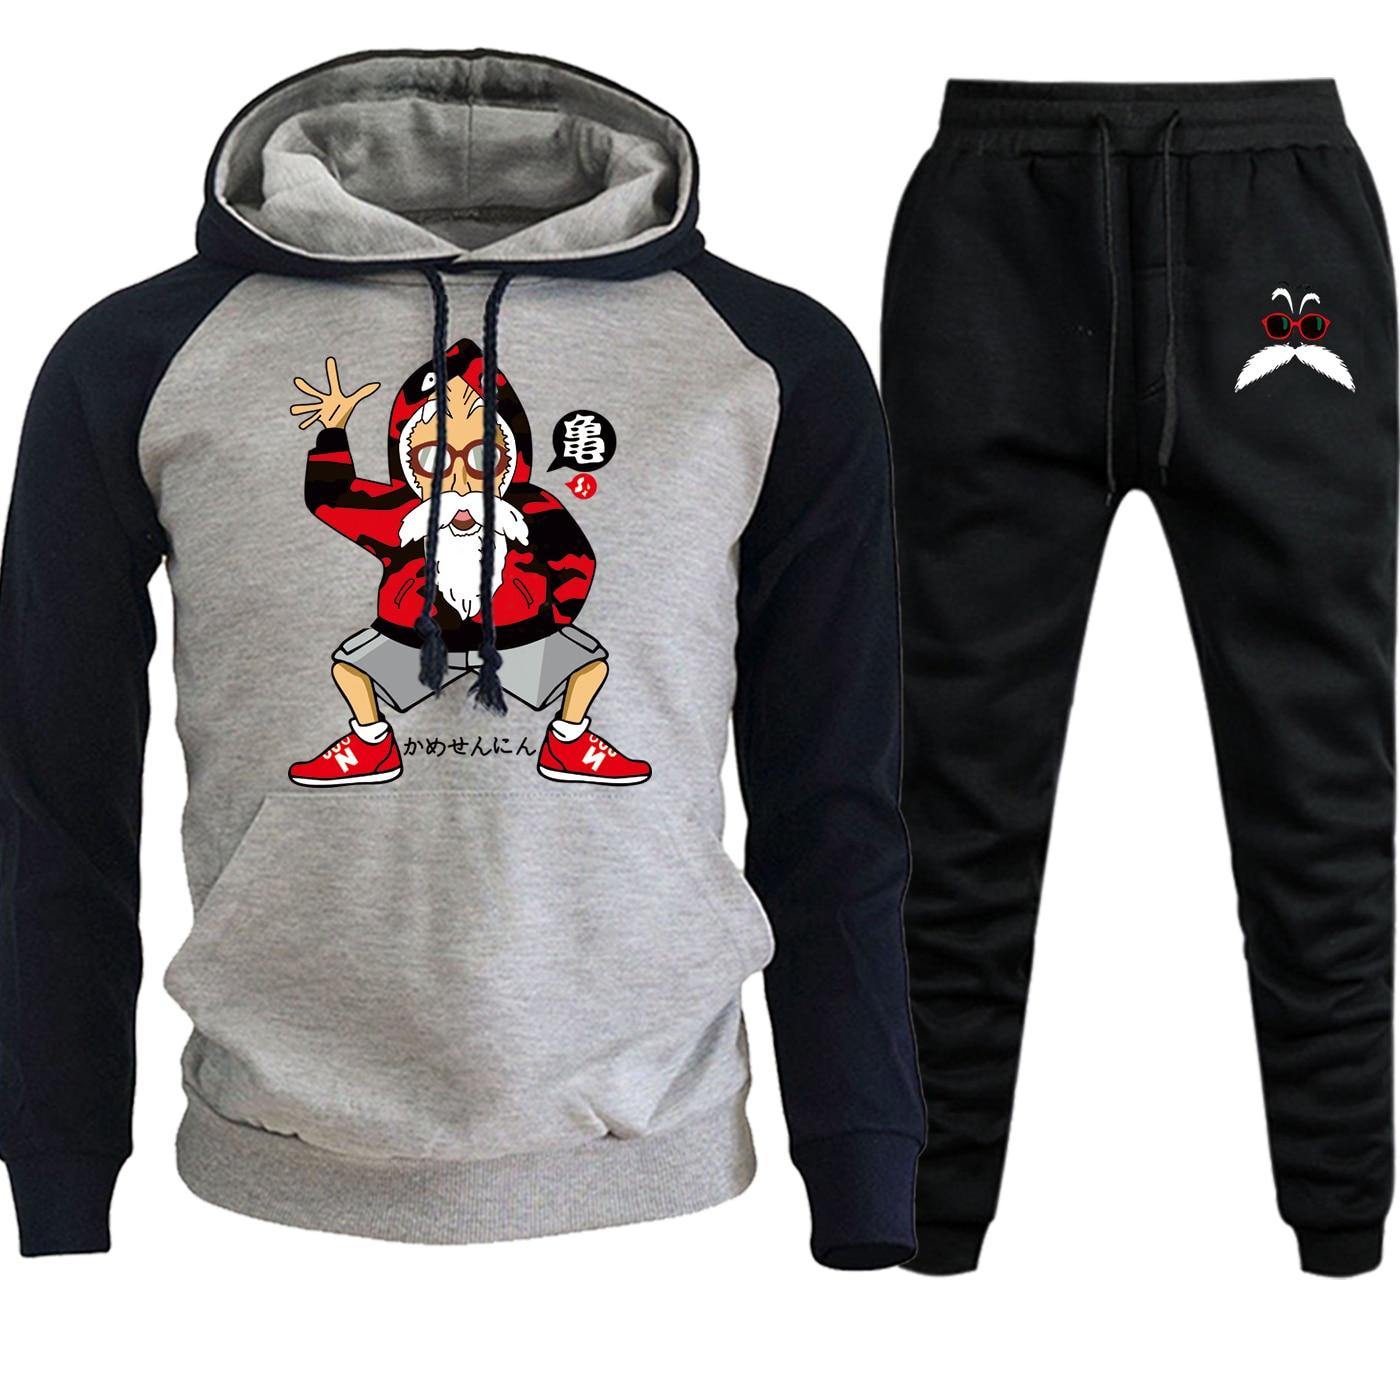 Master Roshi Dragon Ball Fashion Streetwear Raglan Men Hooded Autumn Winter 2019 Cartoon Suit Hip Hop Hoodies+Pants 2 Piece Set